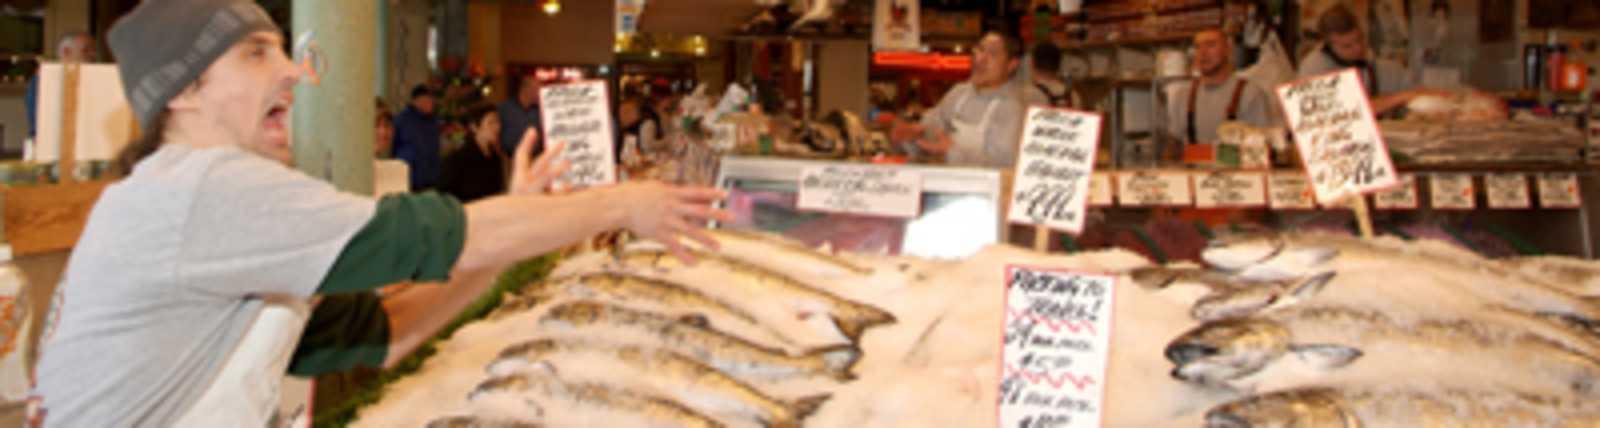 Pike_Place_Fish_Market.jpg